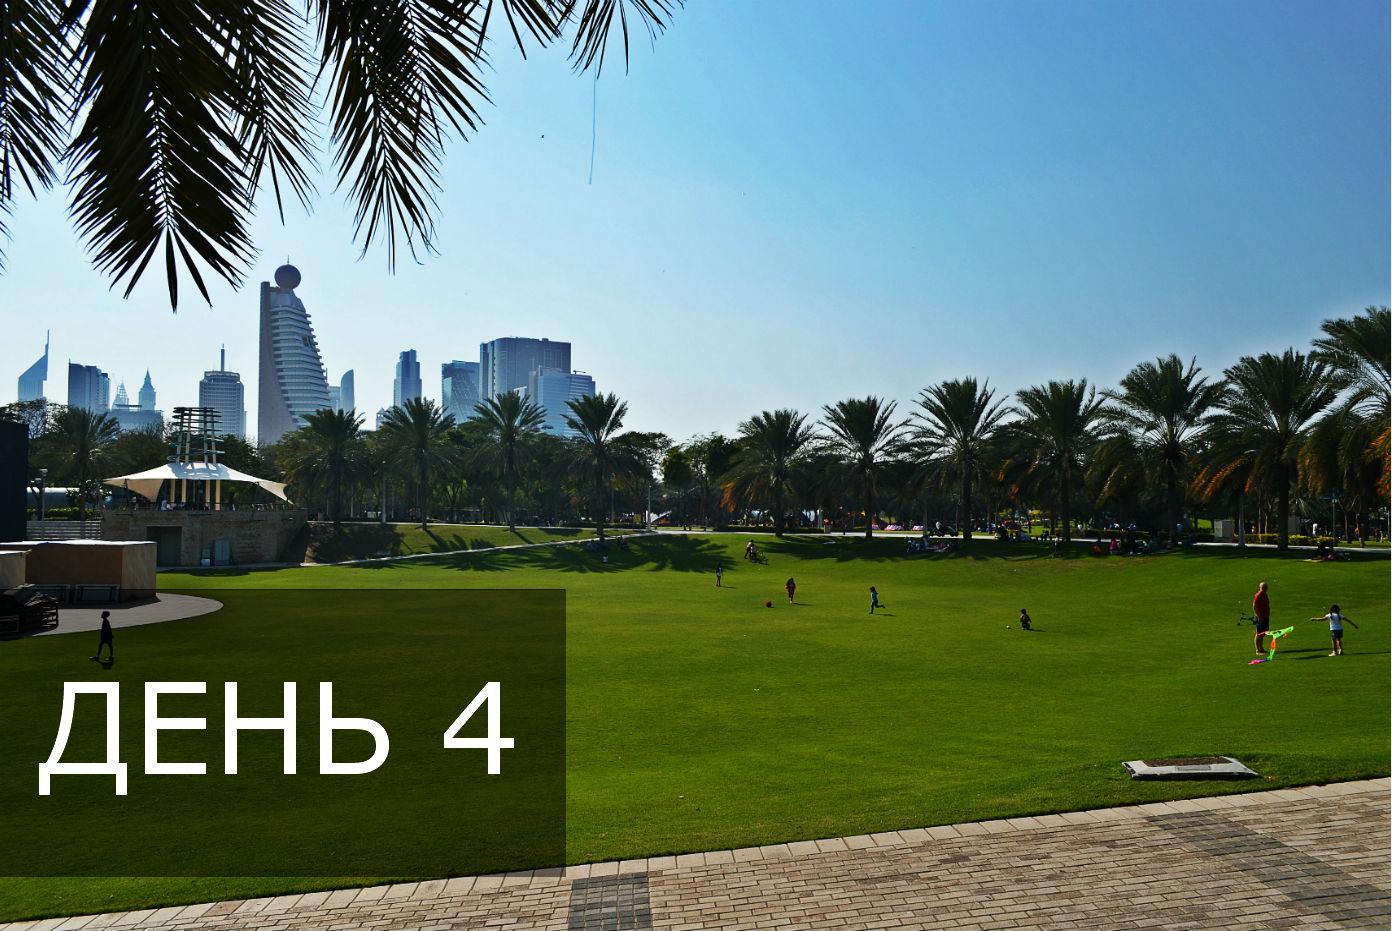 Дубаи, Zabeel Park, Dubai Mall, Burj Khalifa